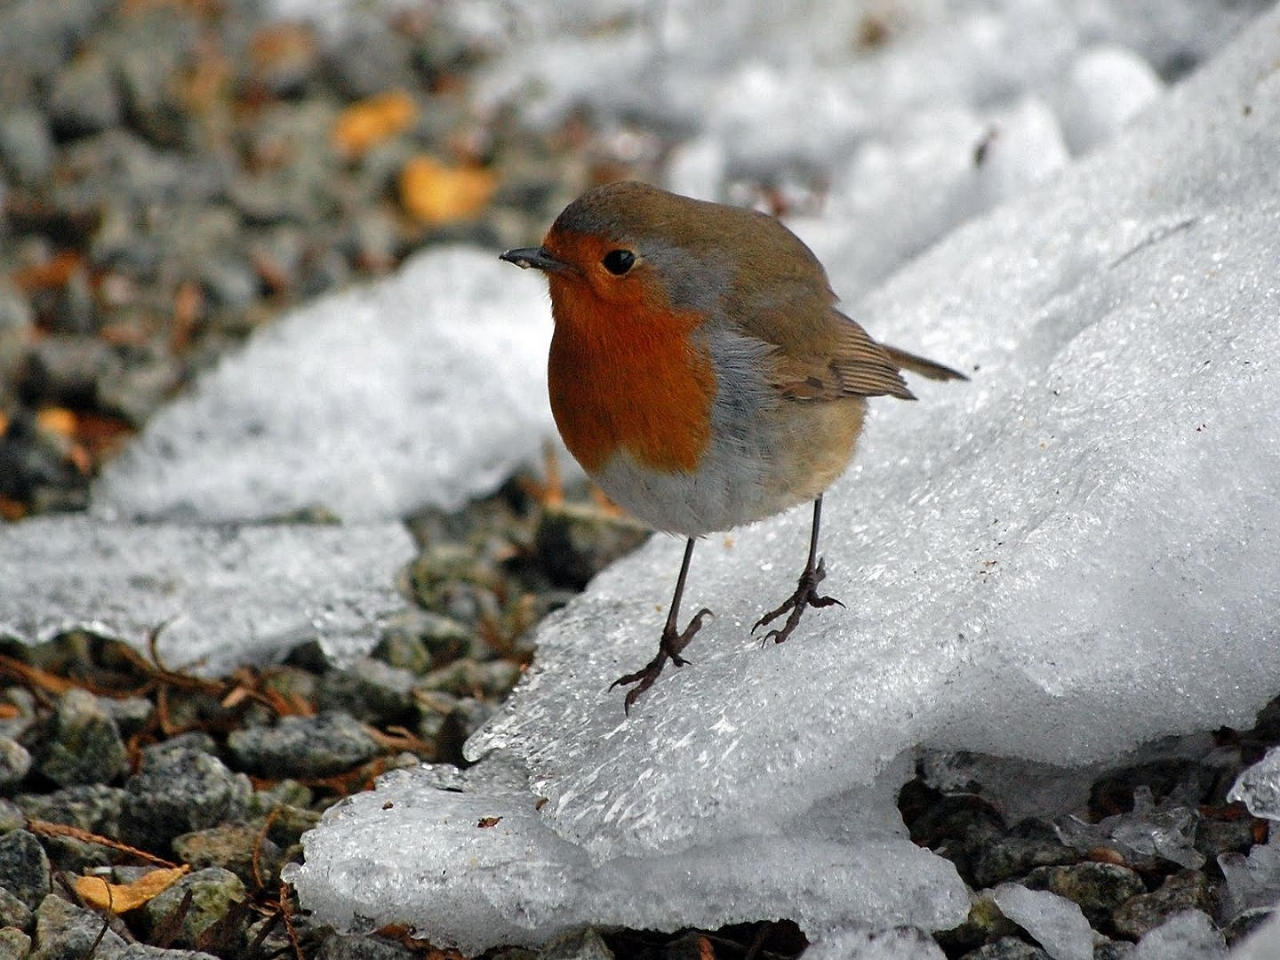 Animals Winter bird desktop wallpaper nr 59181 by katrin 1280x960